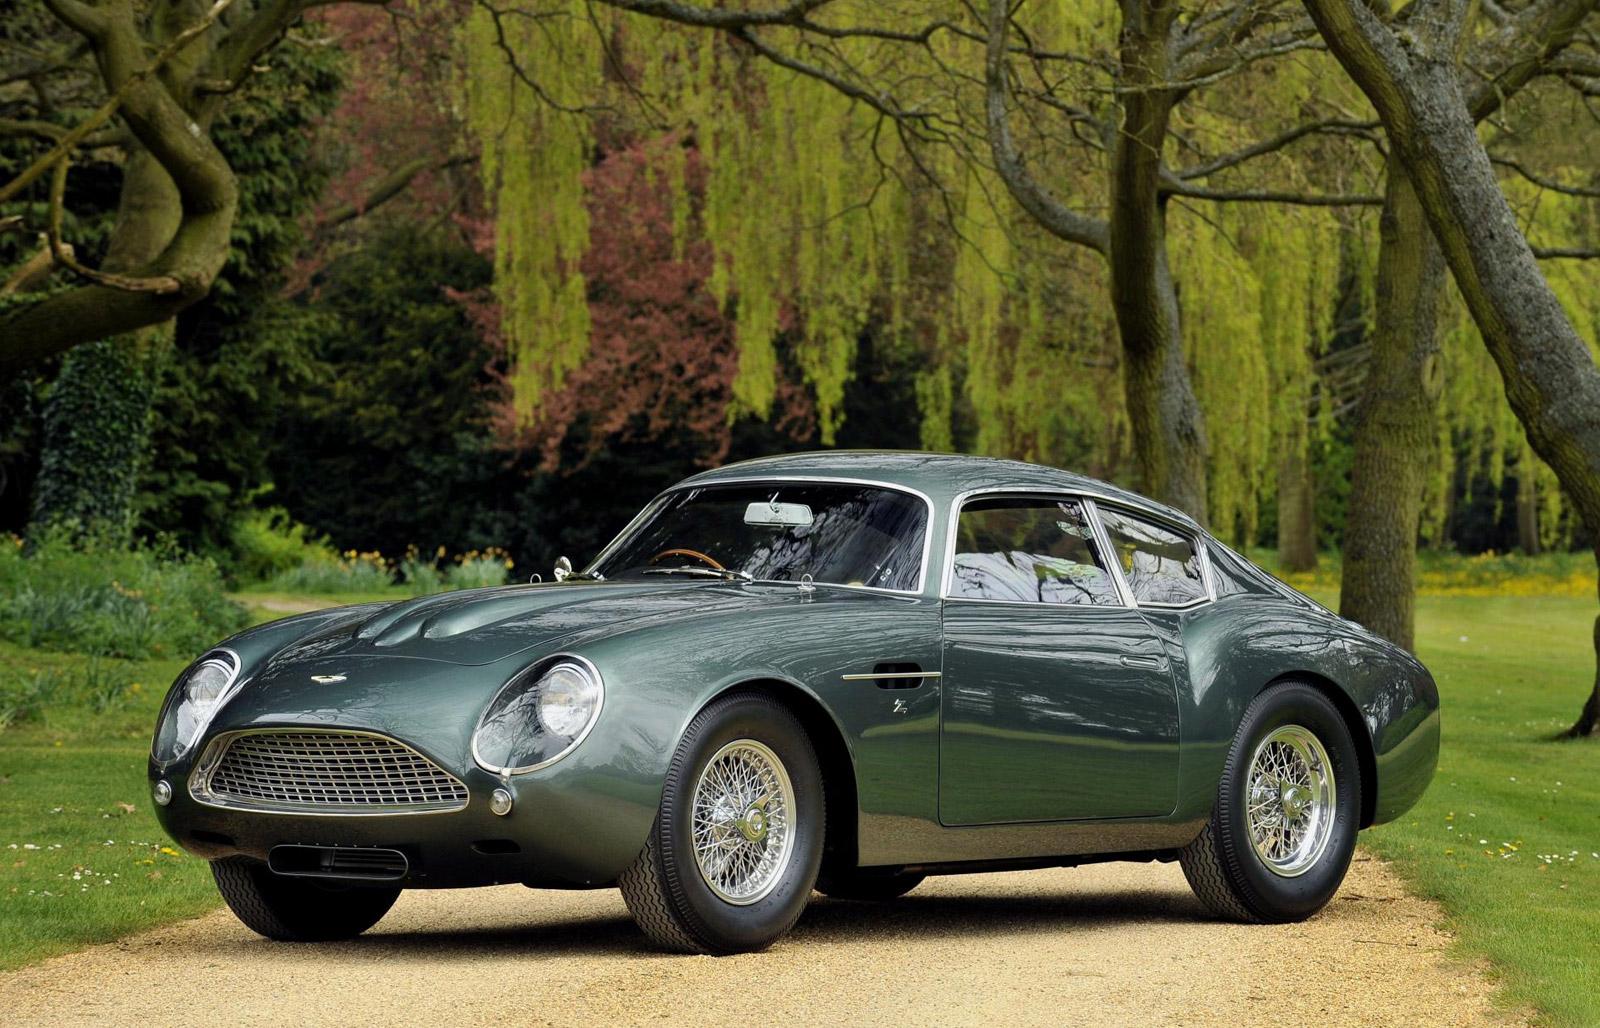 Aston Martin Db4 >> Rare Aston Martins Set To Go Under The Hammer